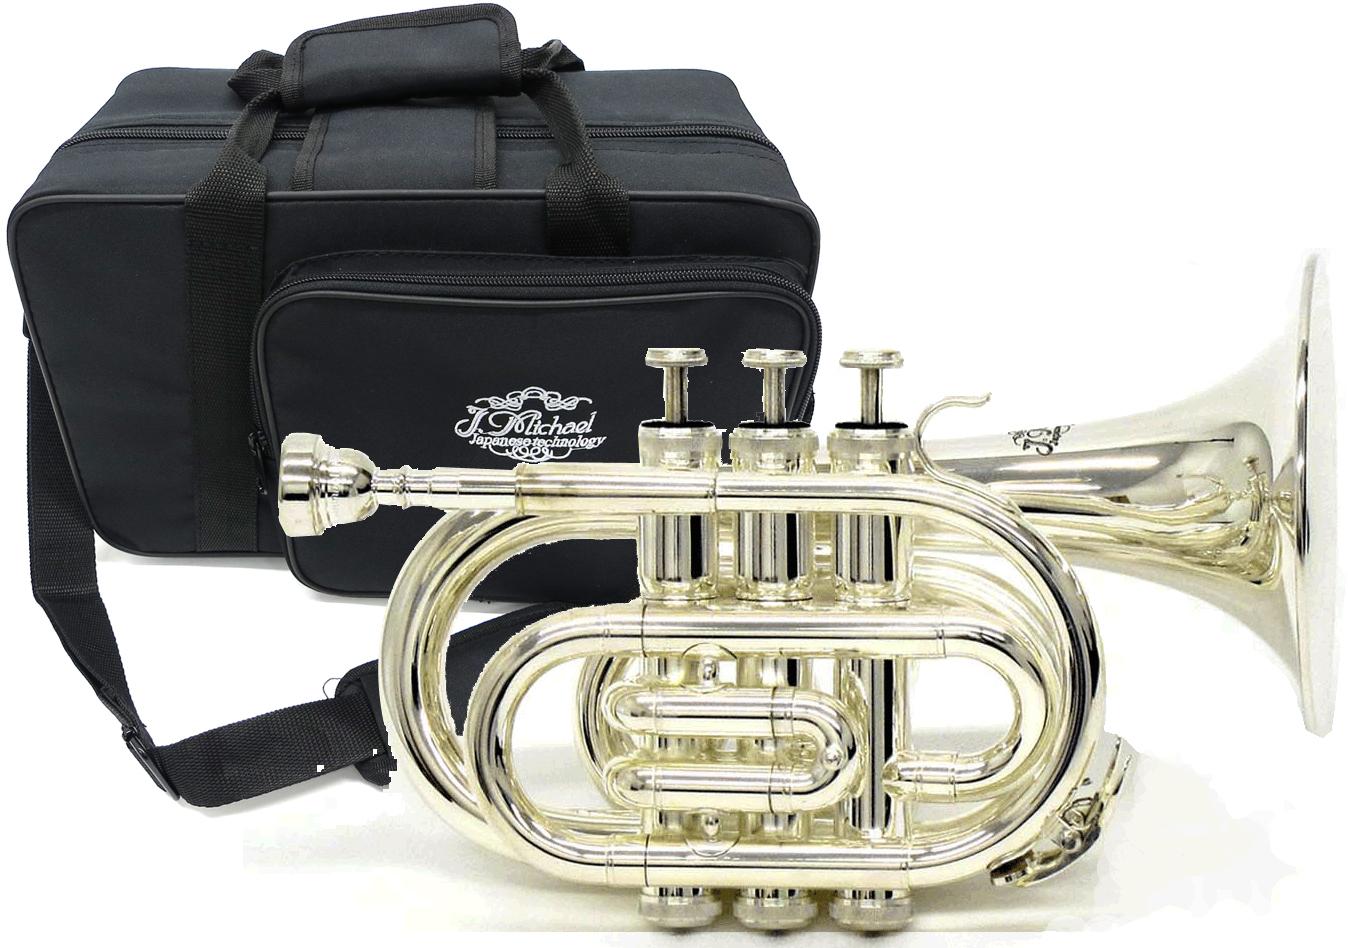 J Michael ( Jマイケル ) TR-400PSL 銀メッキ ポケットトランペット 新品 アウトレット 管体 B♭ ミニ トランペット 管楽器 mini pocket trumpet silver TR400PSL 送料無料